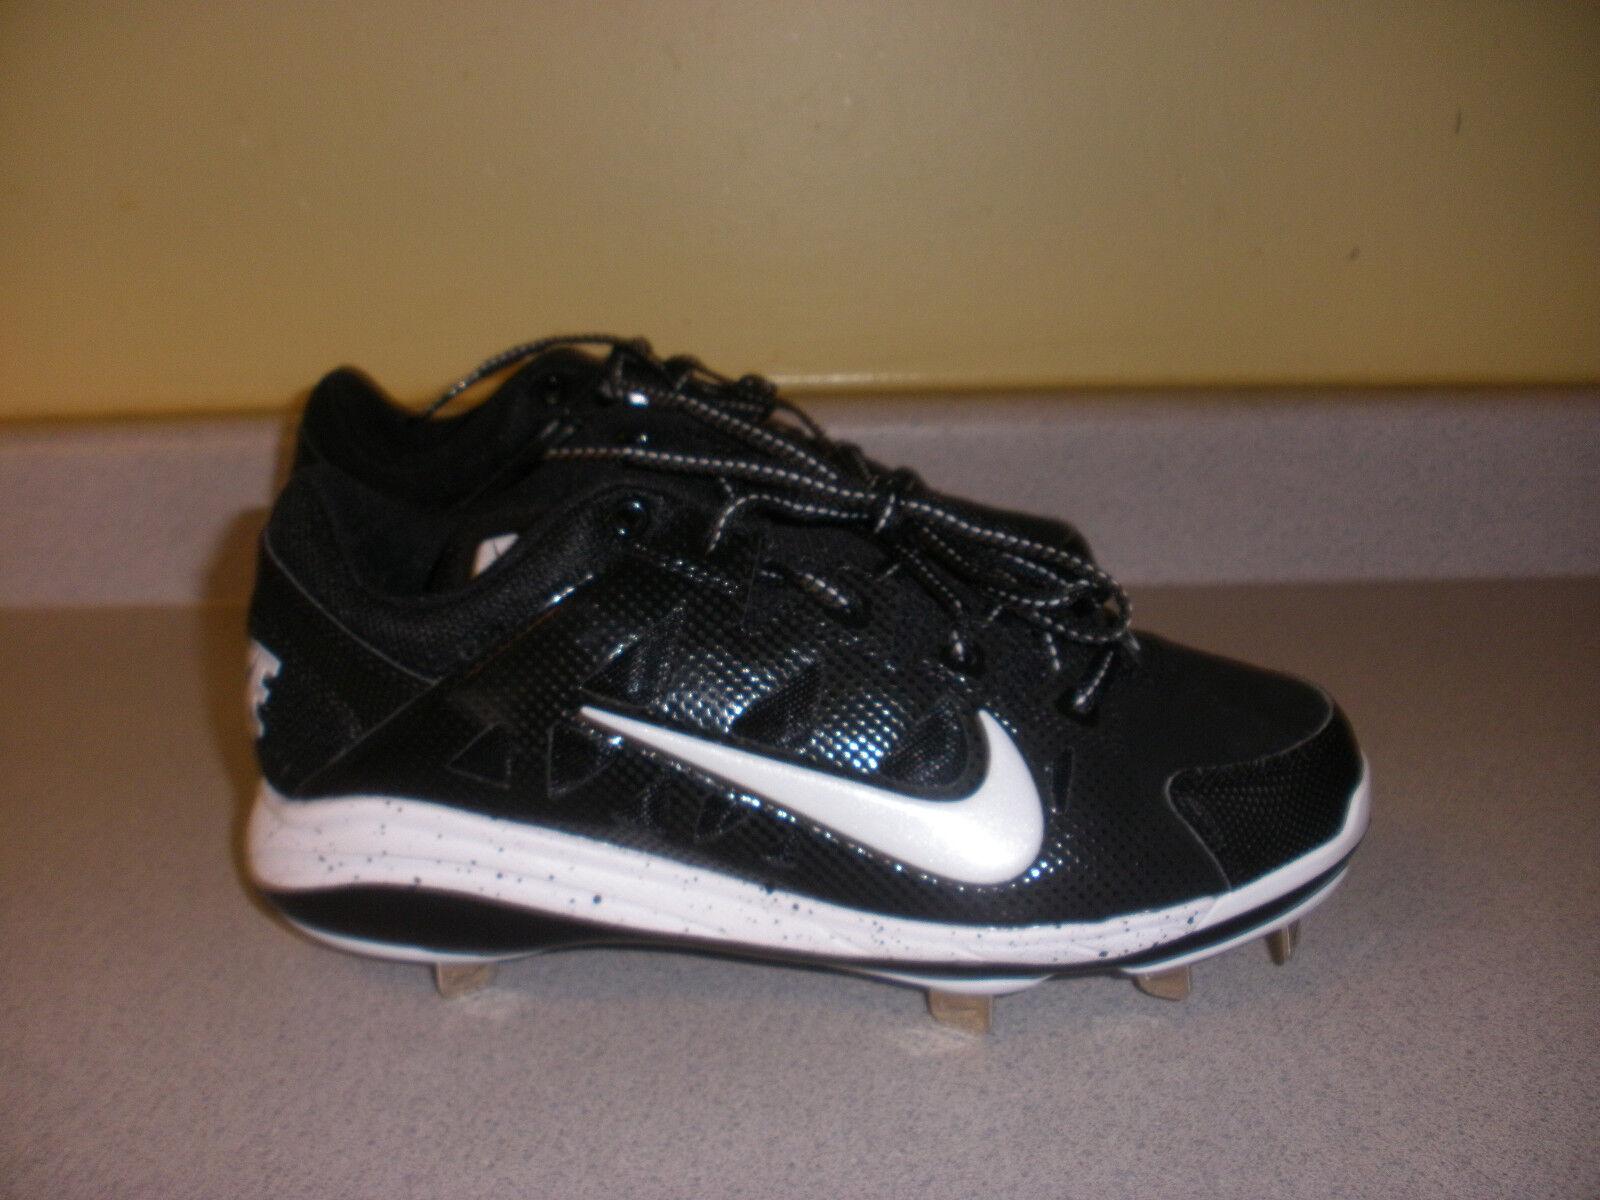 Men's Nike Hyper Diamond Baseball Cleats Size 8 white black